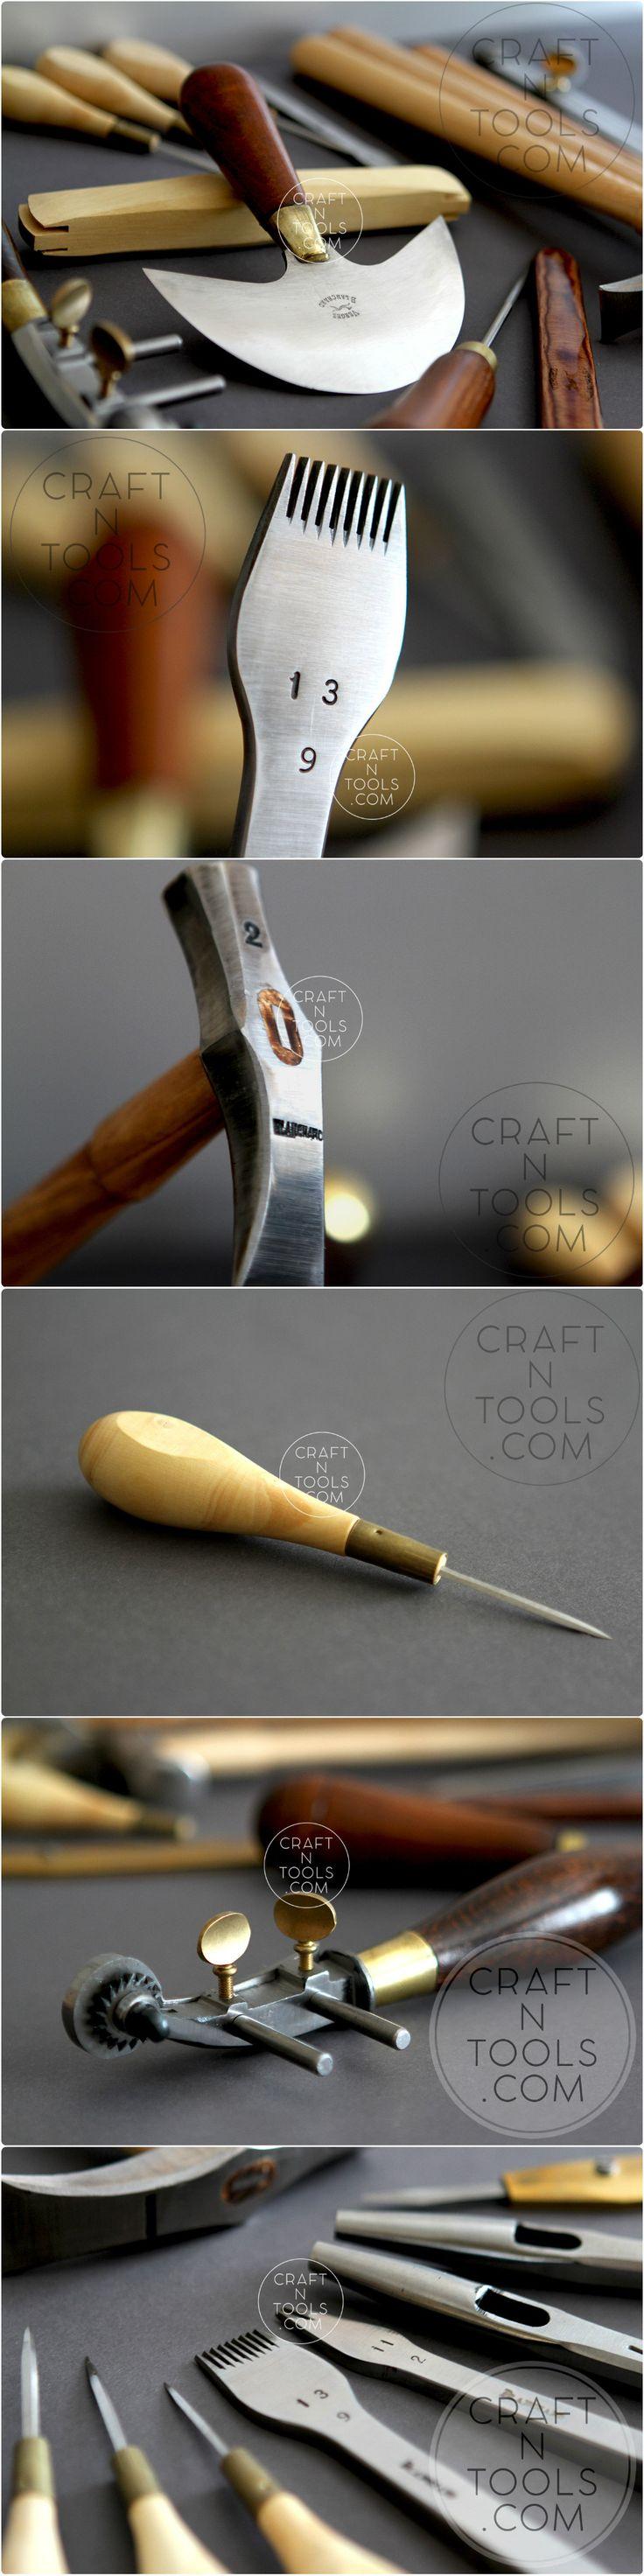 Vergez Blanchard tools for leathercraft #craftntools #leathercraft #leatherart #vergezblanchard #leathertools